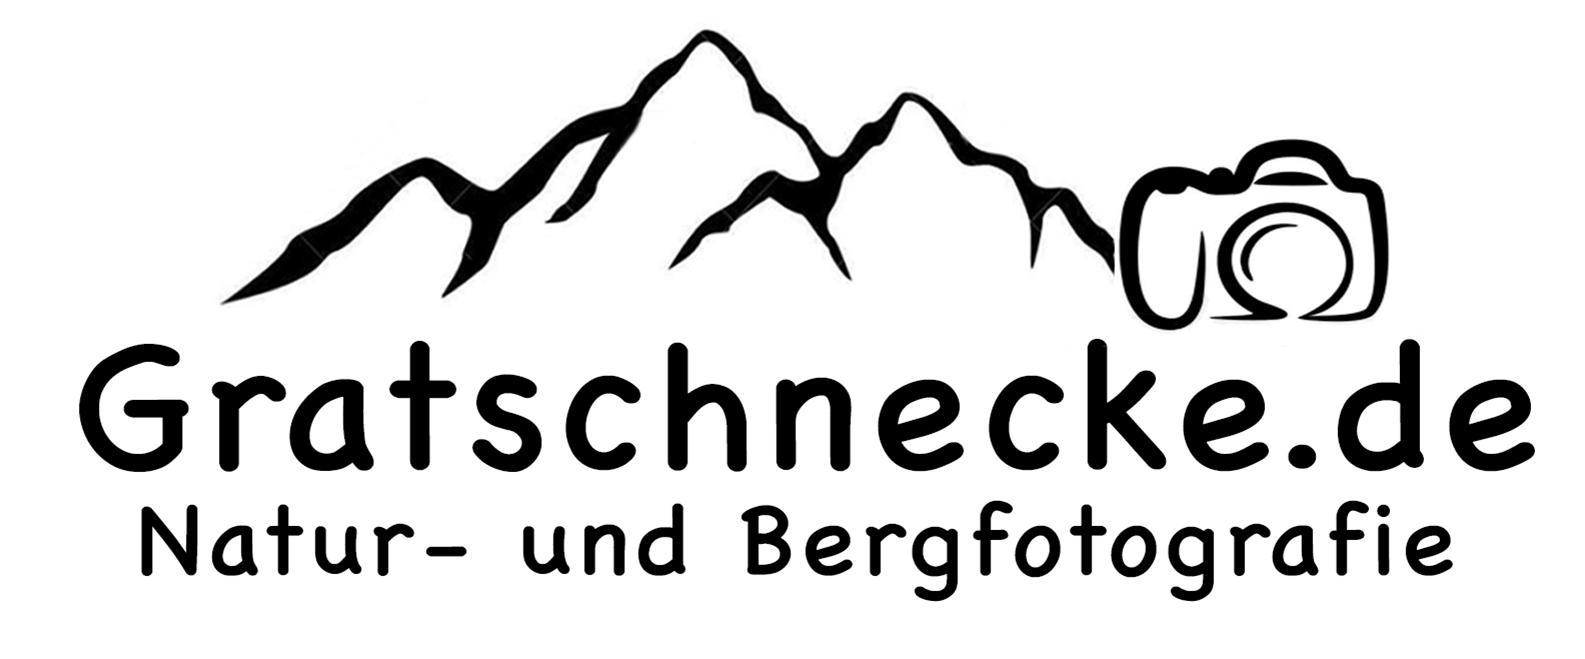 Gratschnecke.de